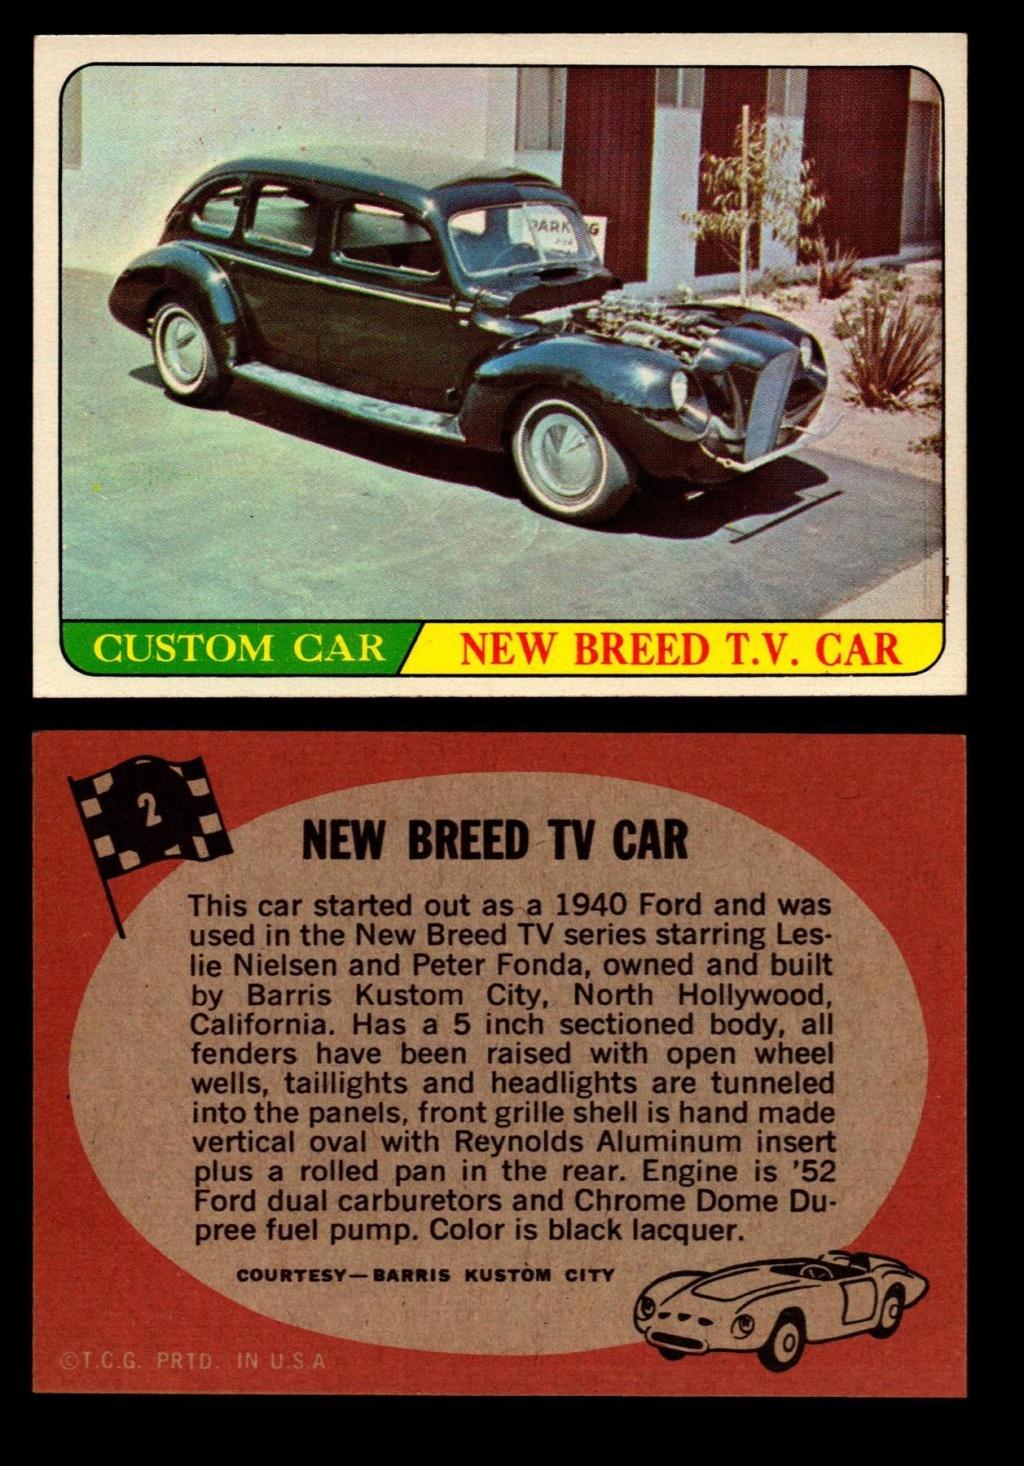 Hot Rods Topps - Vintage Trading Cards 1968 - Custom car - Dragster - Racer - Dream car - Barris Kustom City - Ed Roth Darrill Starbird, Gene Winfield, Bill Cuchenberry 2_989610